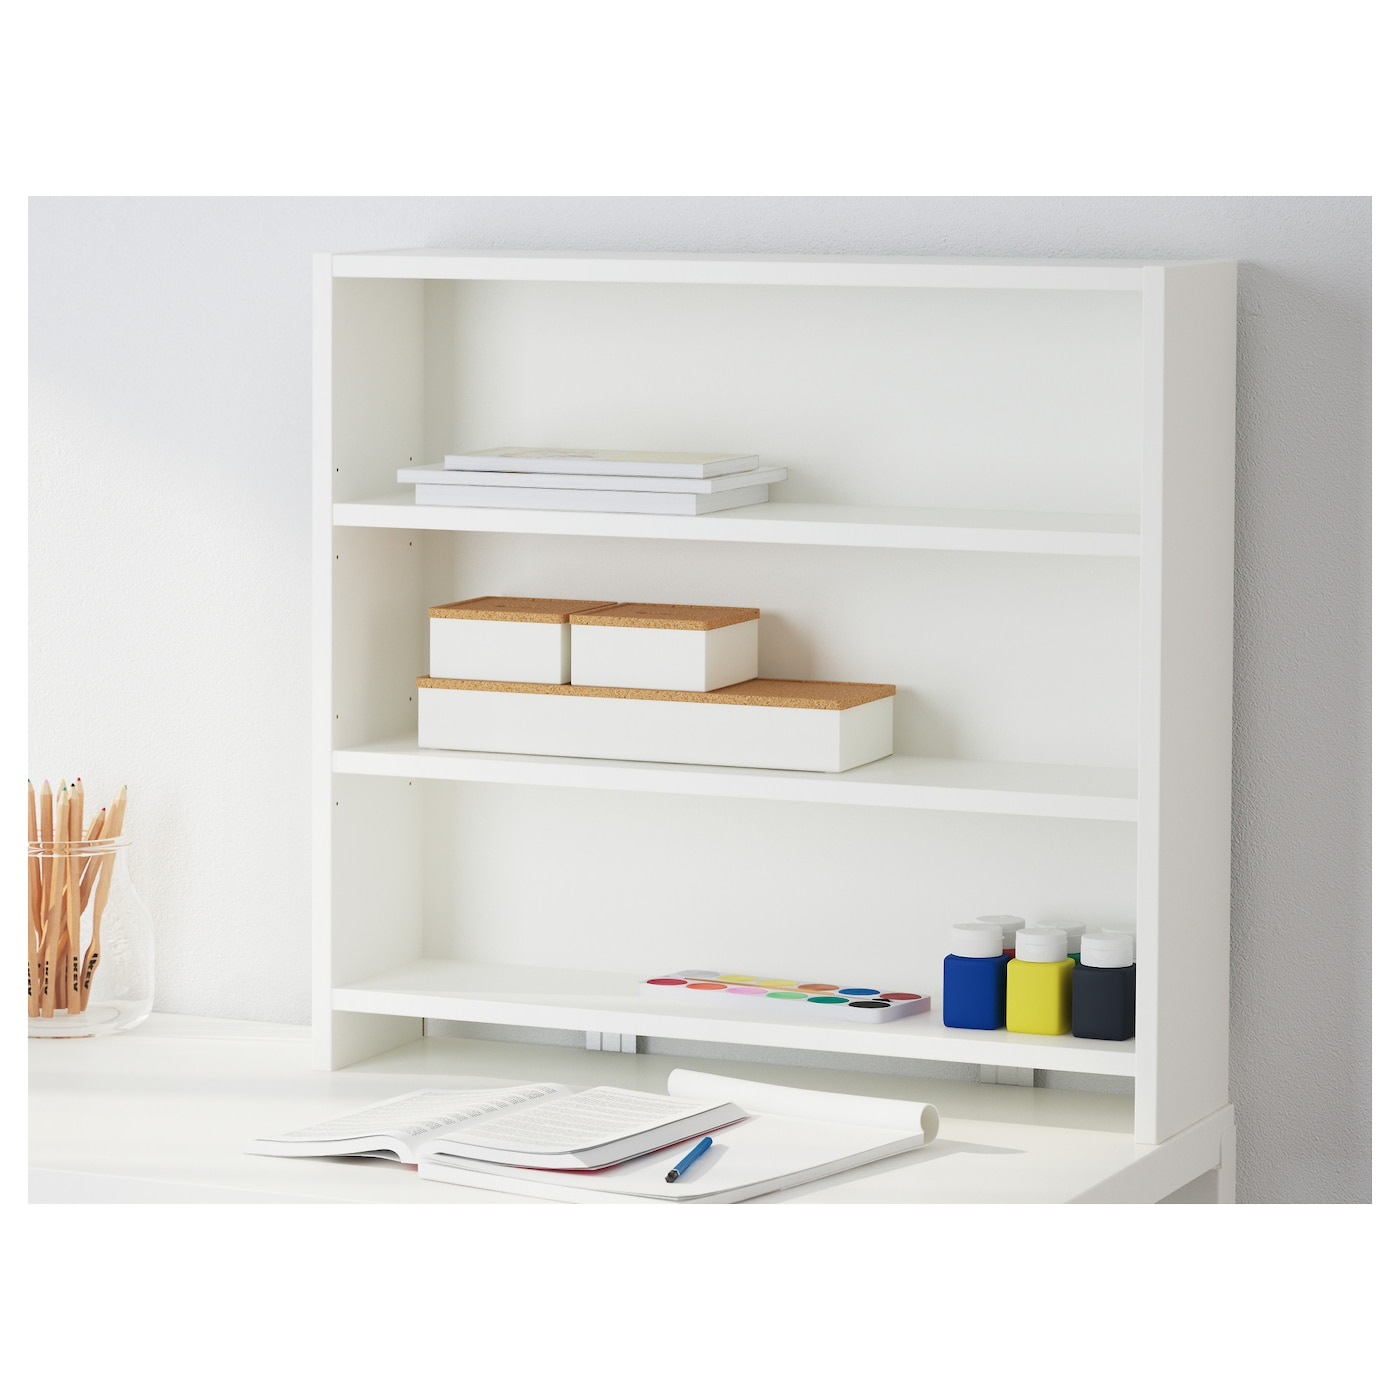 P hl desk top shelf white green 64x60 cm ikea - Etagere a poser sur bureau ...